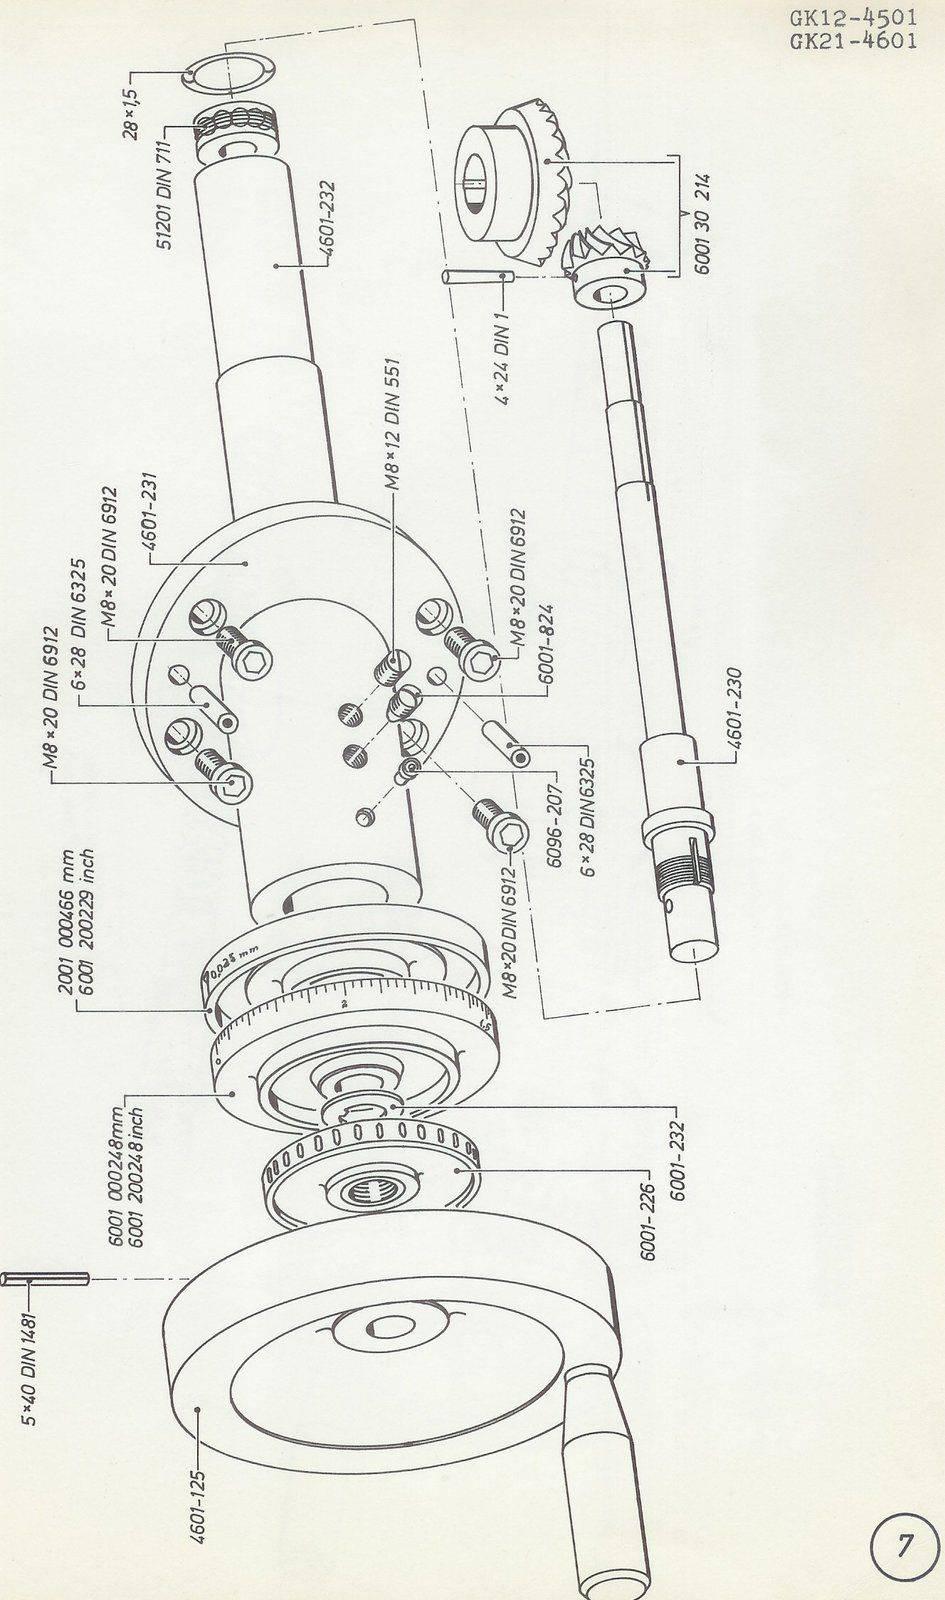 Deckel GK12-21 Parts Catalogue 1975 p7.jpg